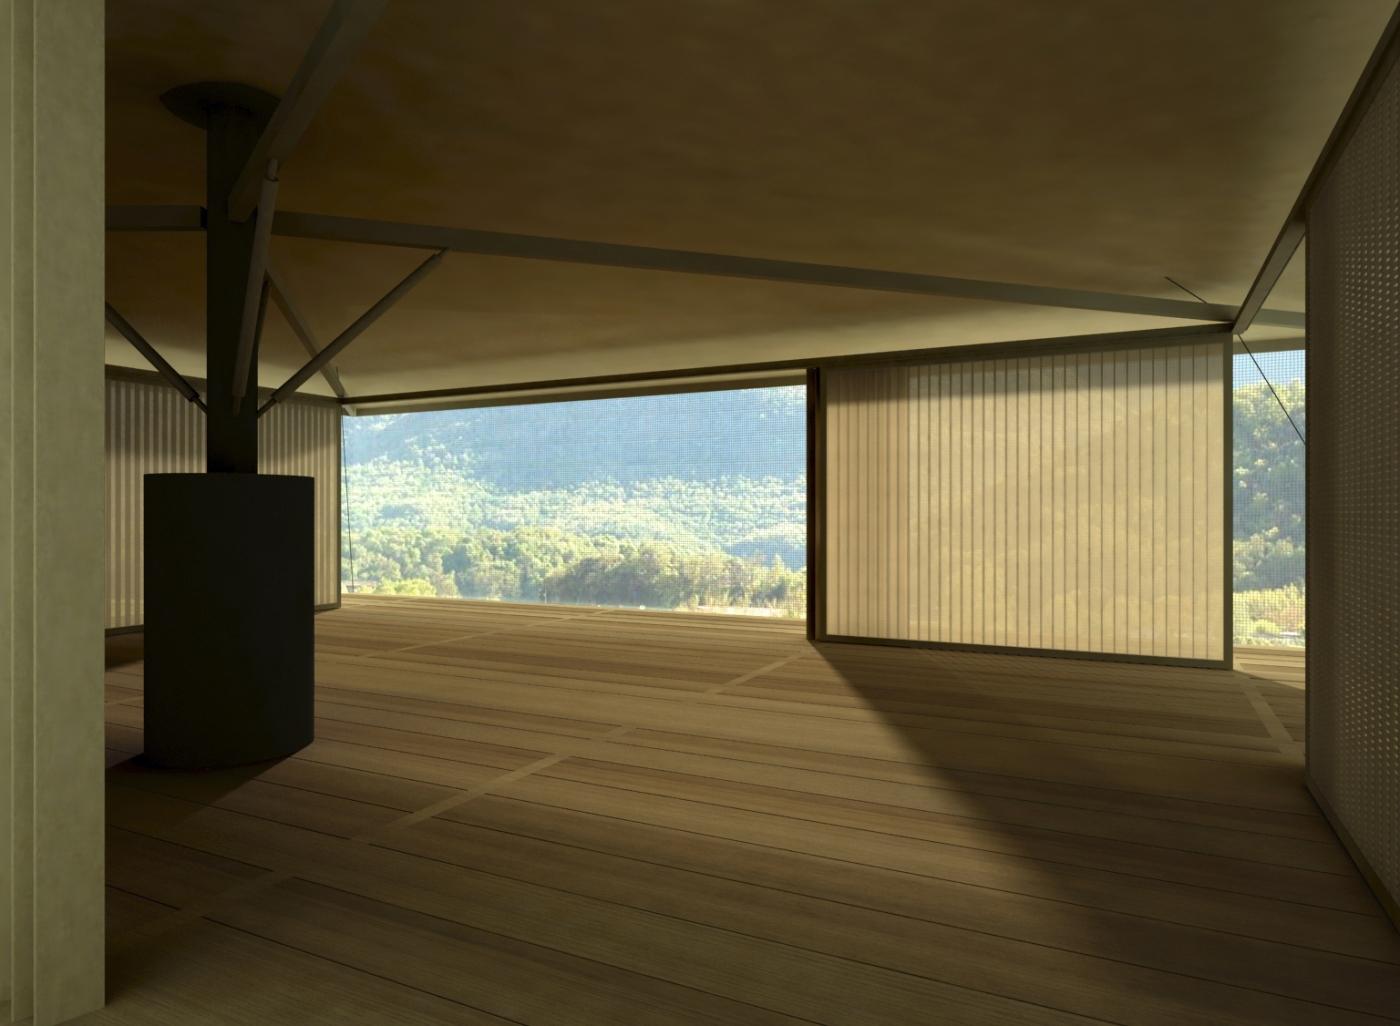 04_HABT_interior 03